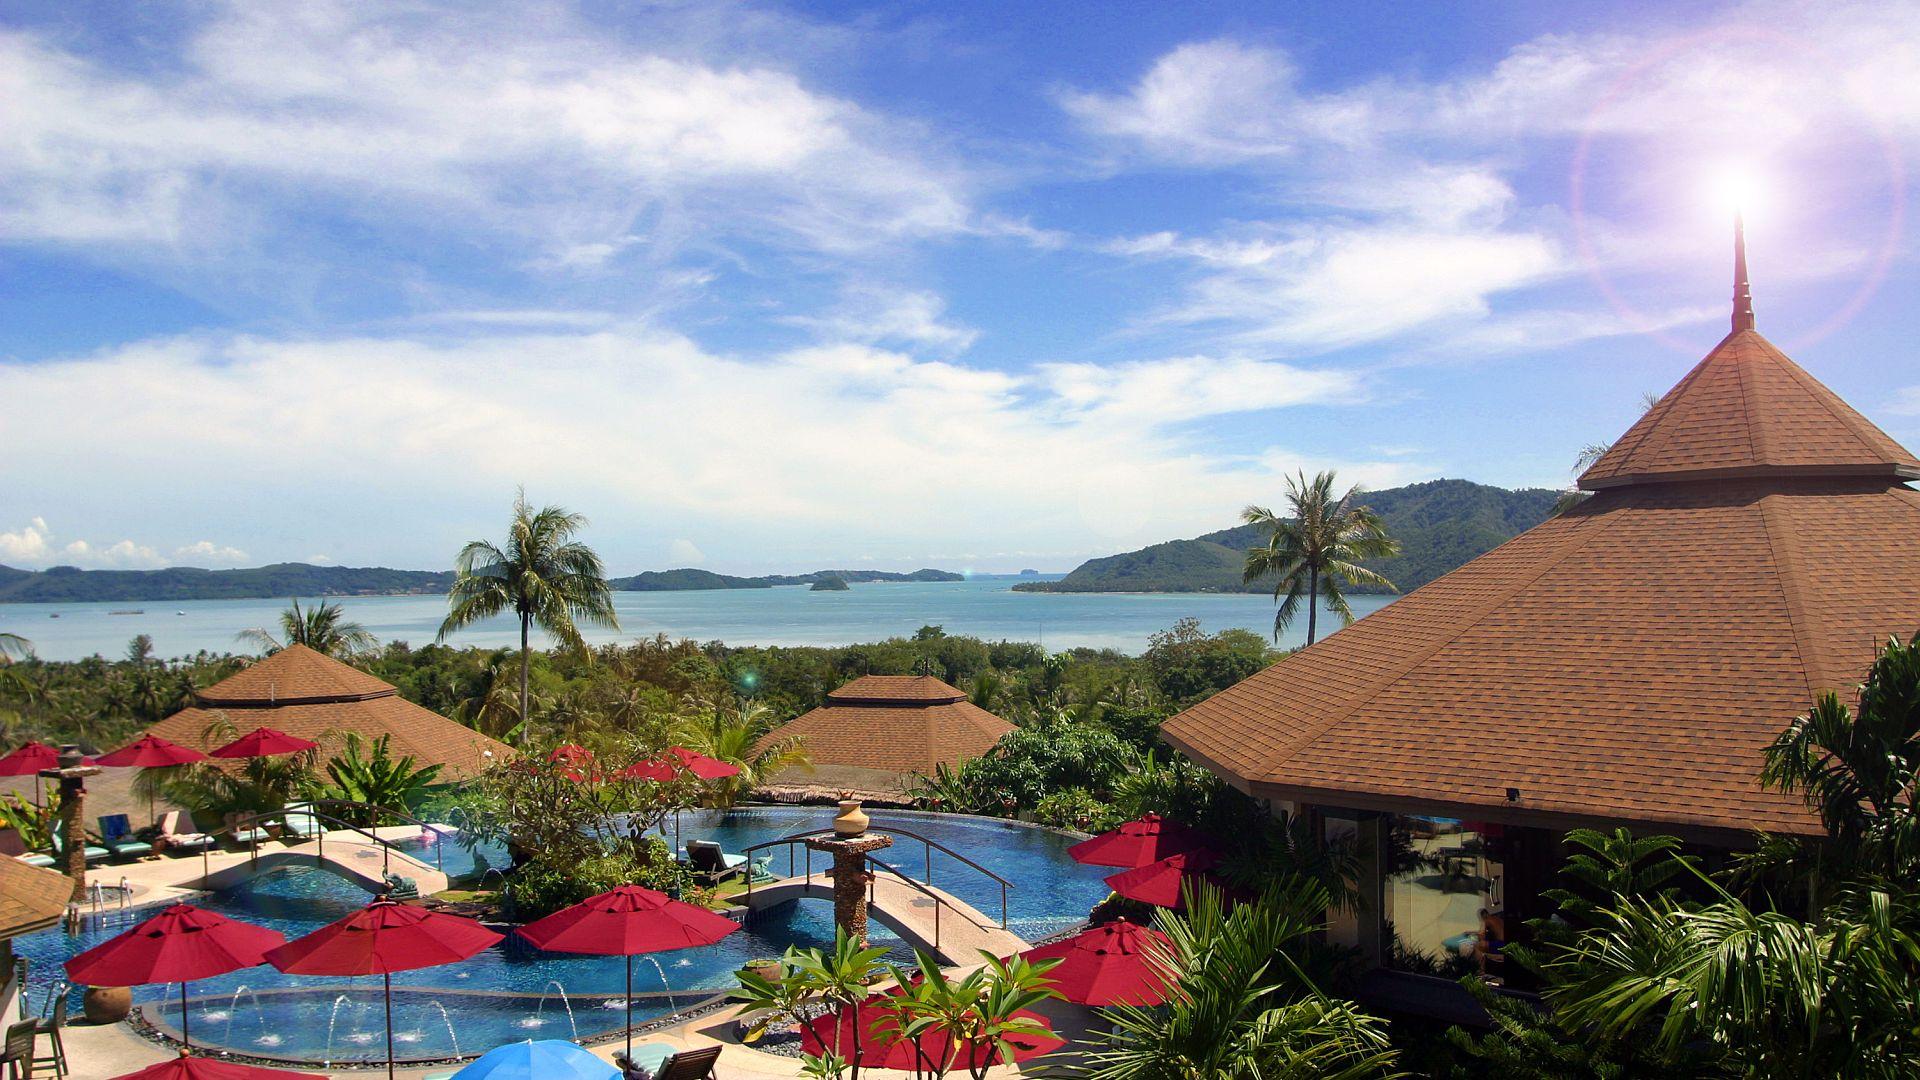 Phuket-Resorts-Mangosteen-Resort-and-Ayurveda-Spa-Pool-with-Seaview